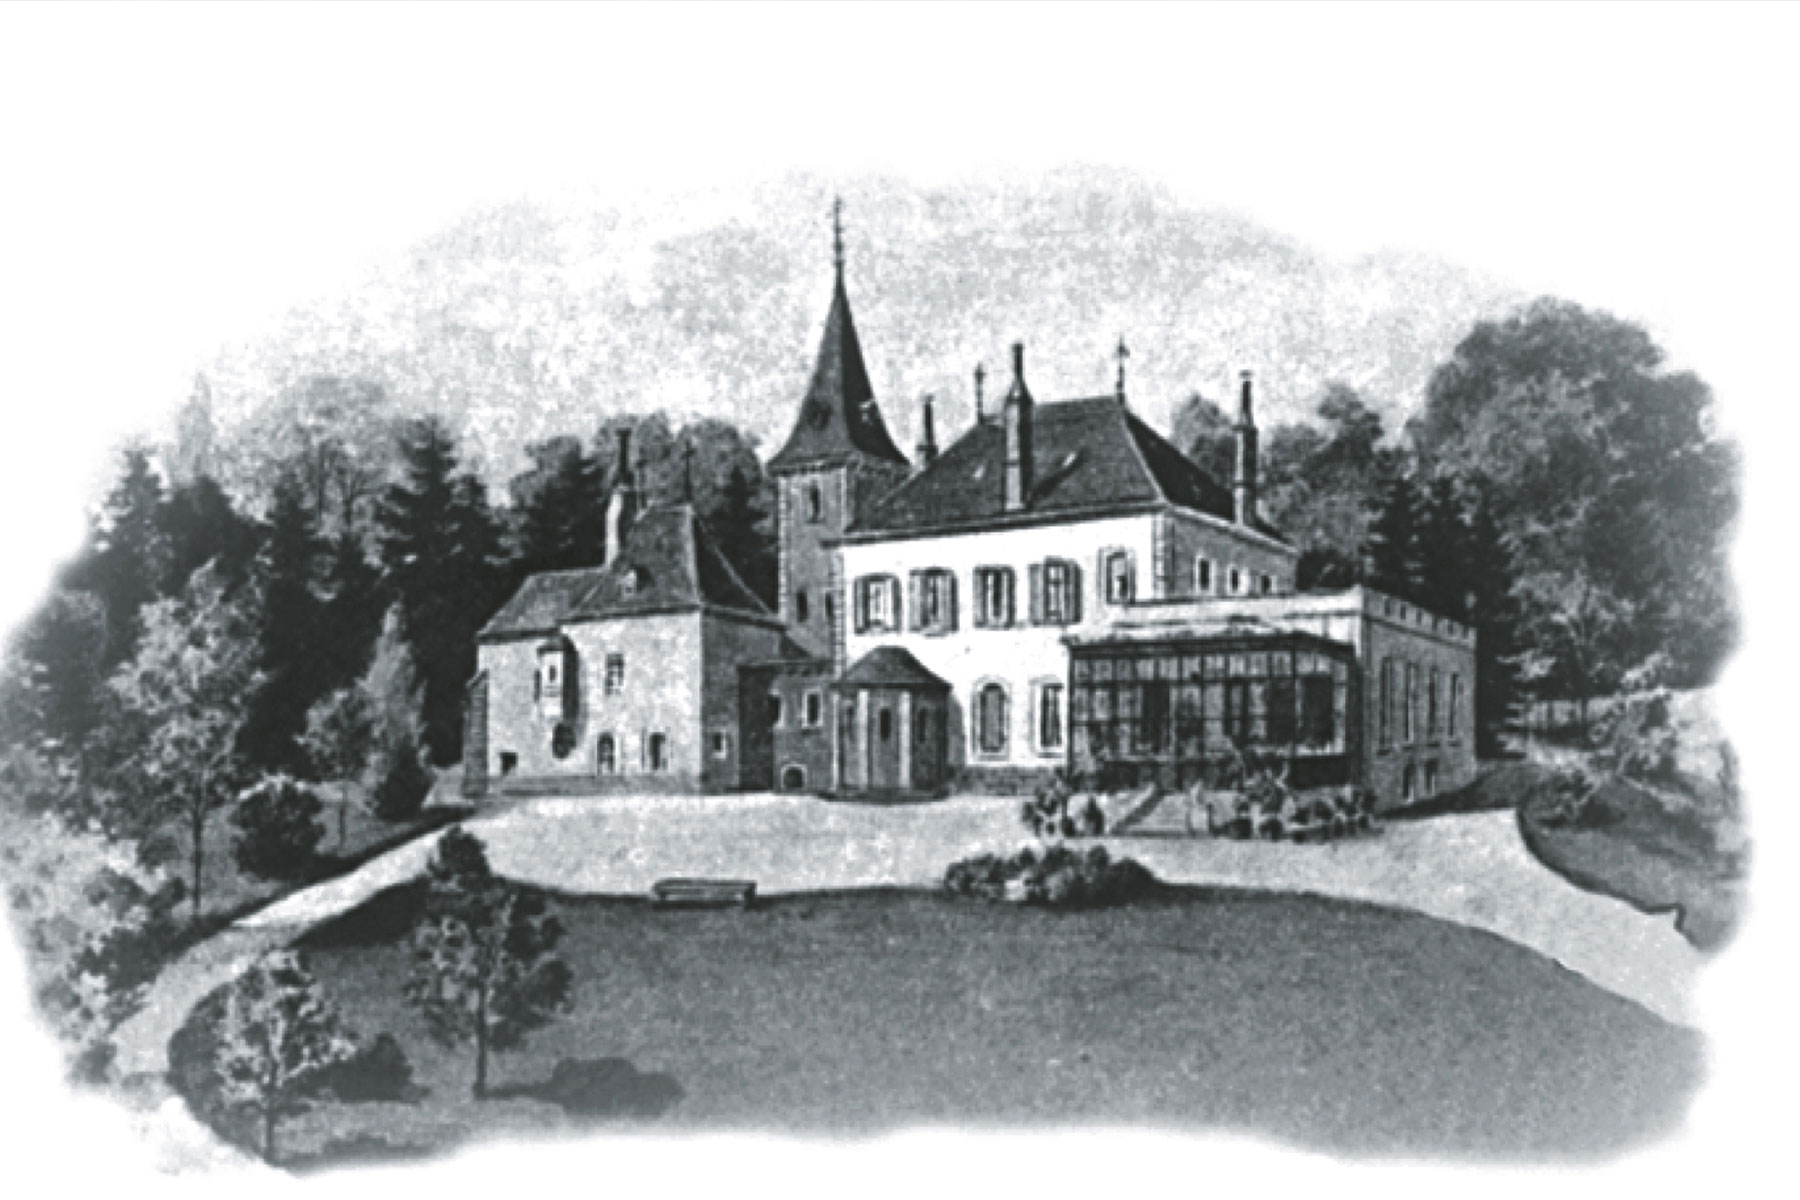 01_03-Histoire-Bourgogne_PierrePonnelle_vin